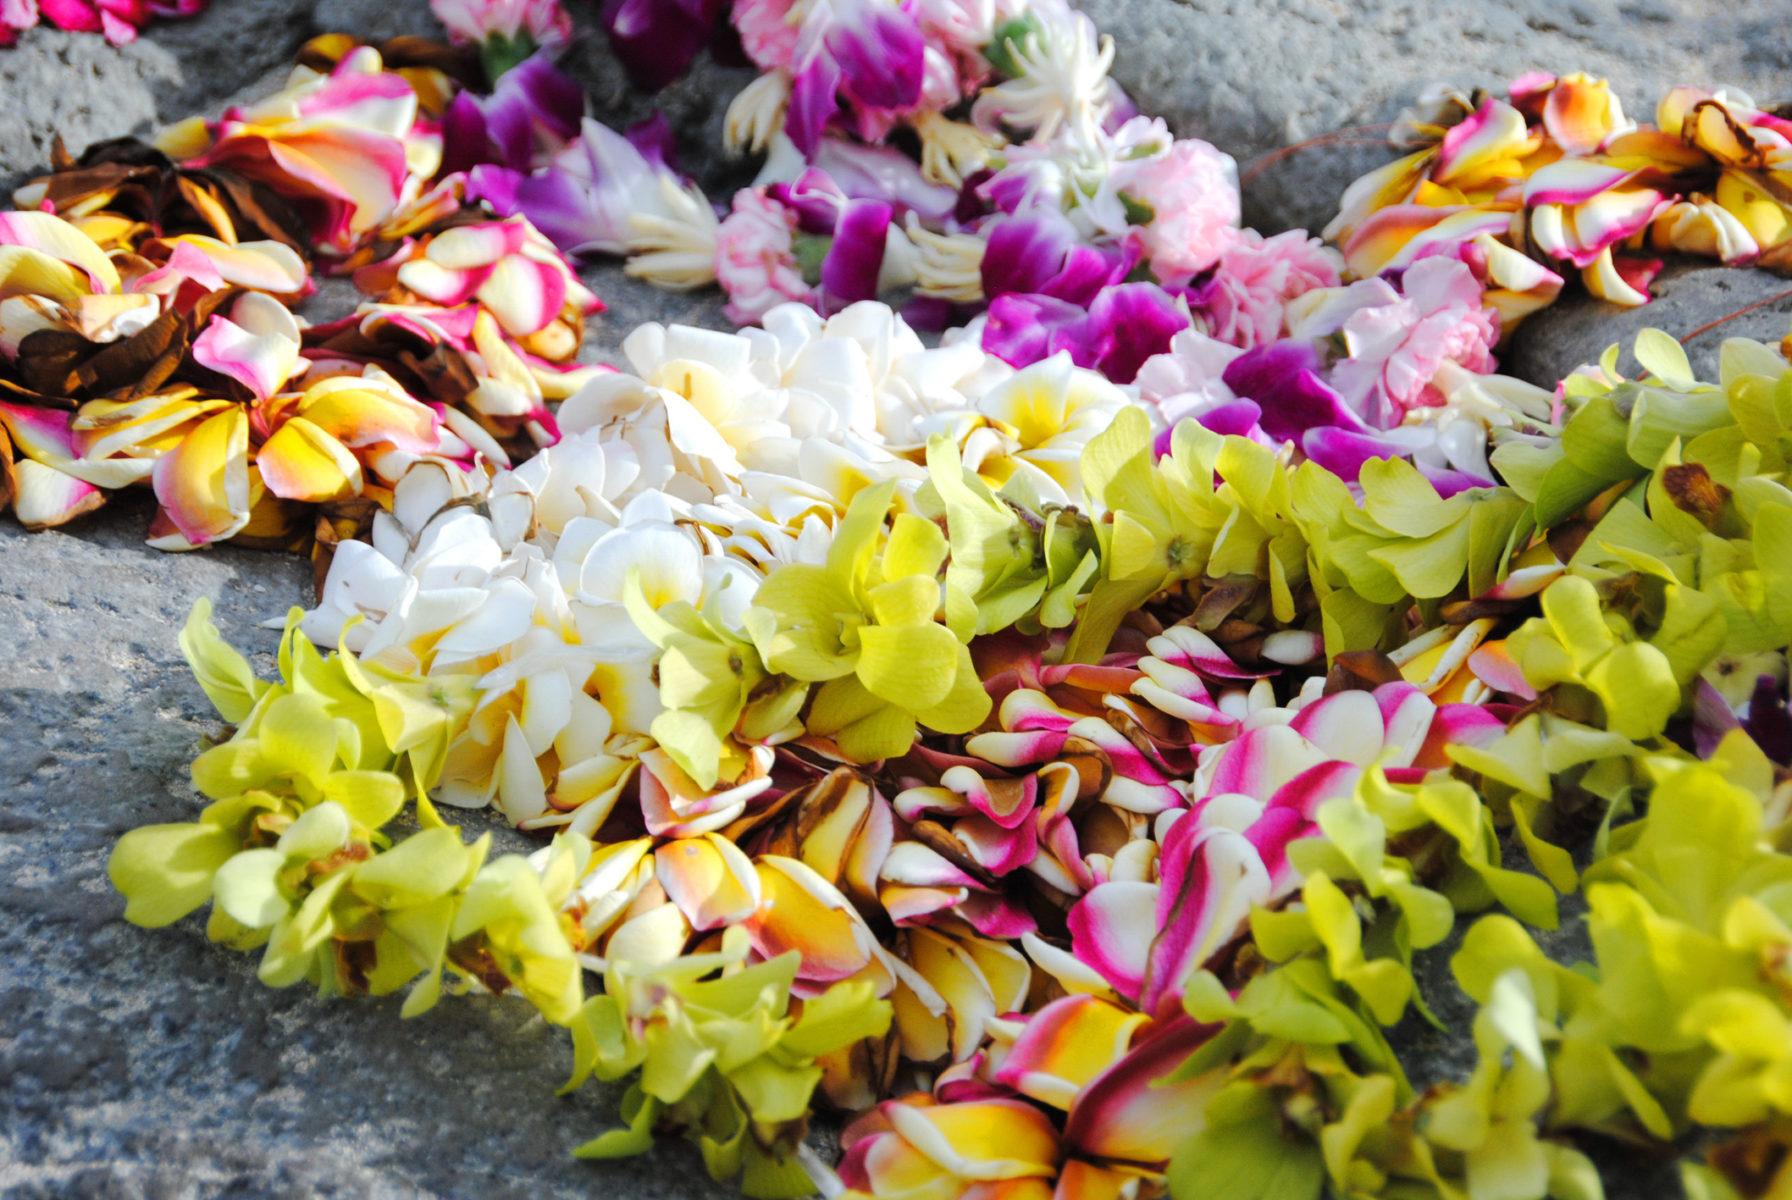 Hawaiian Lei Making Classes Explore The Culture Of The Islands